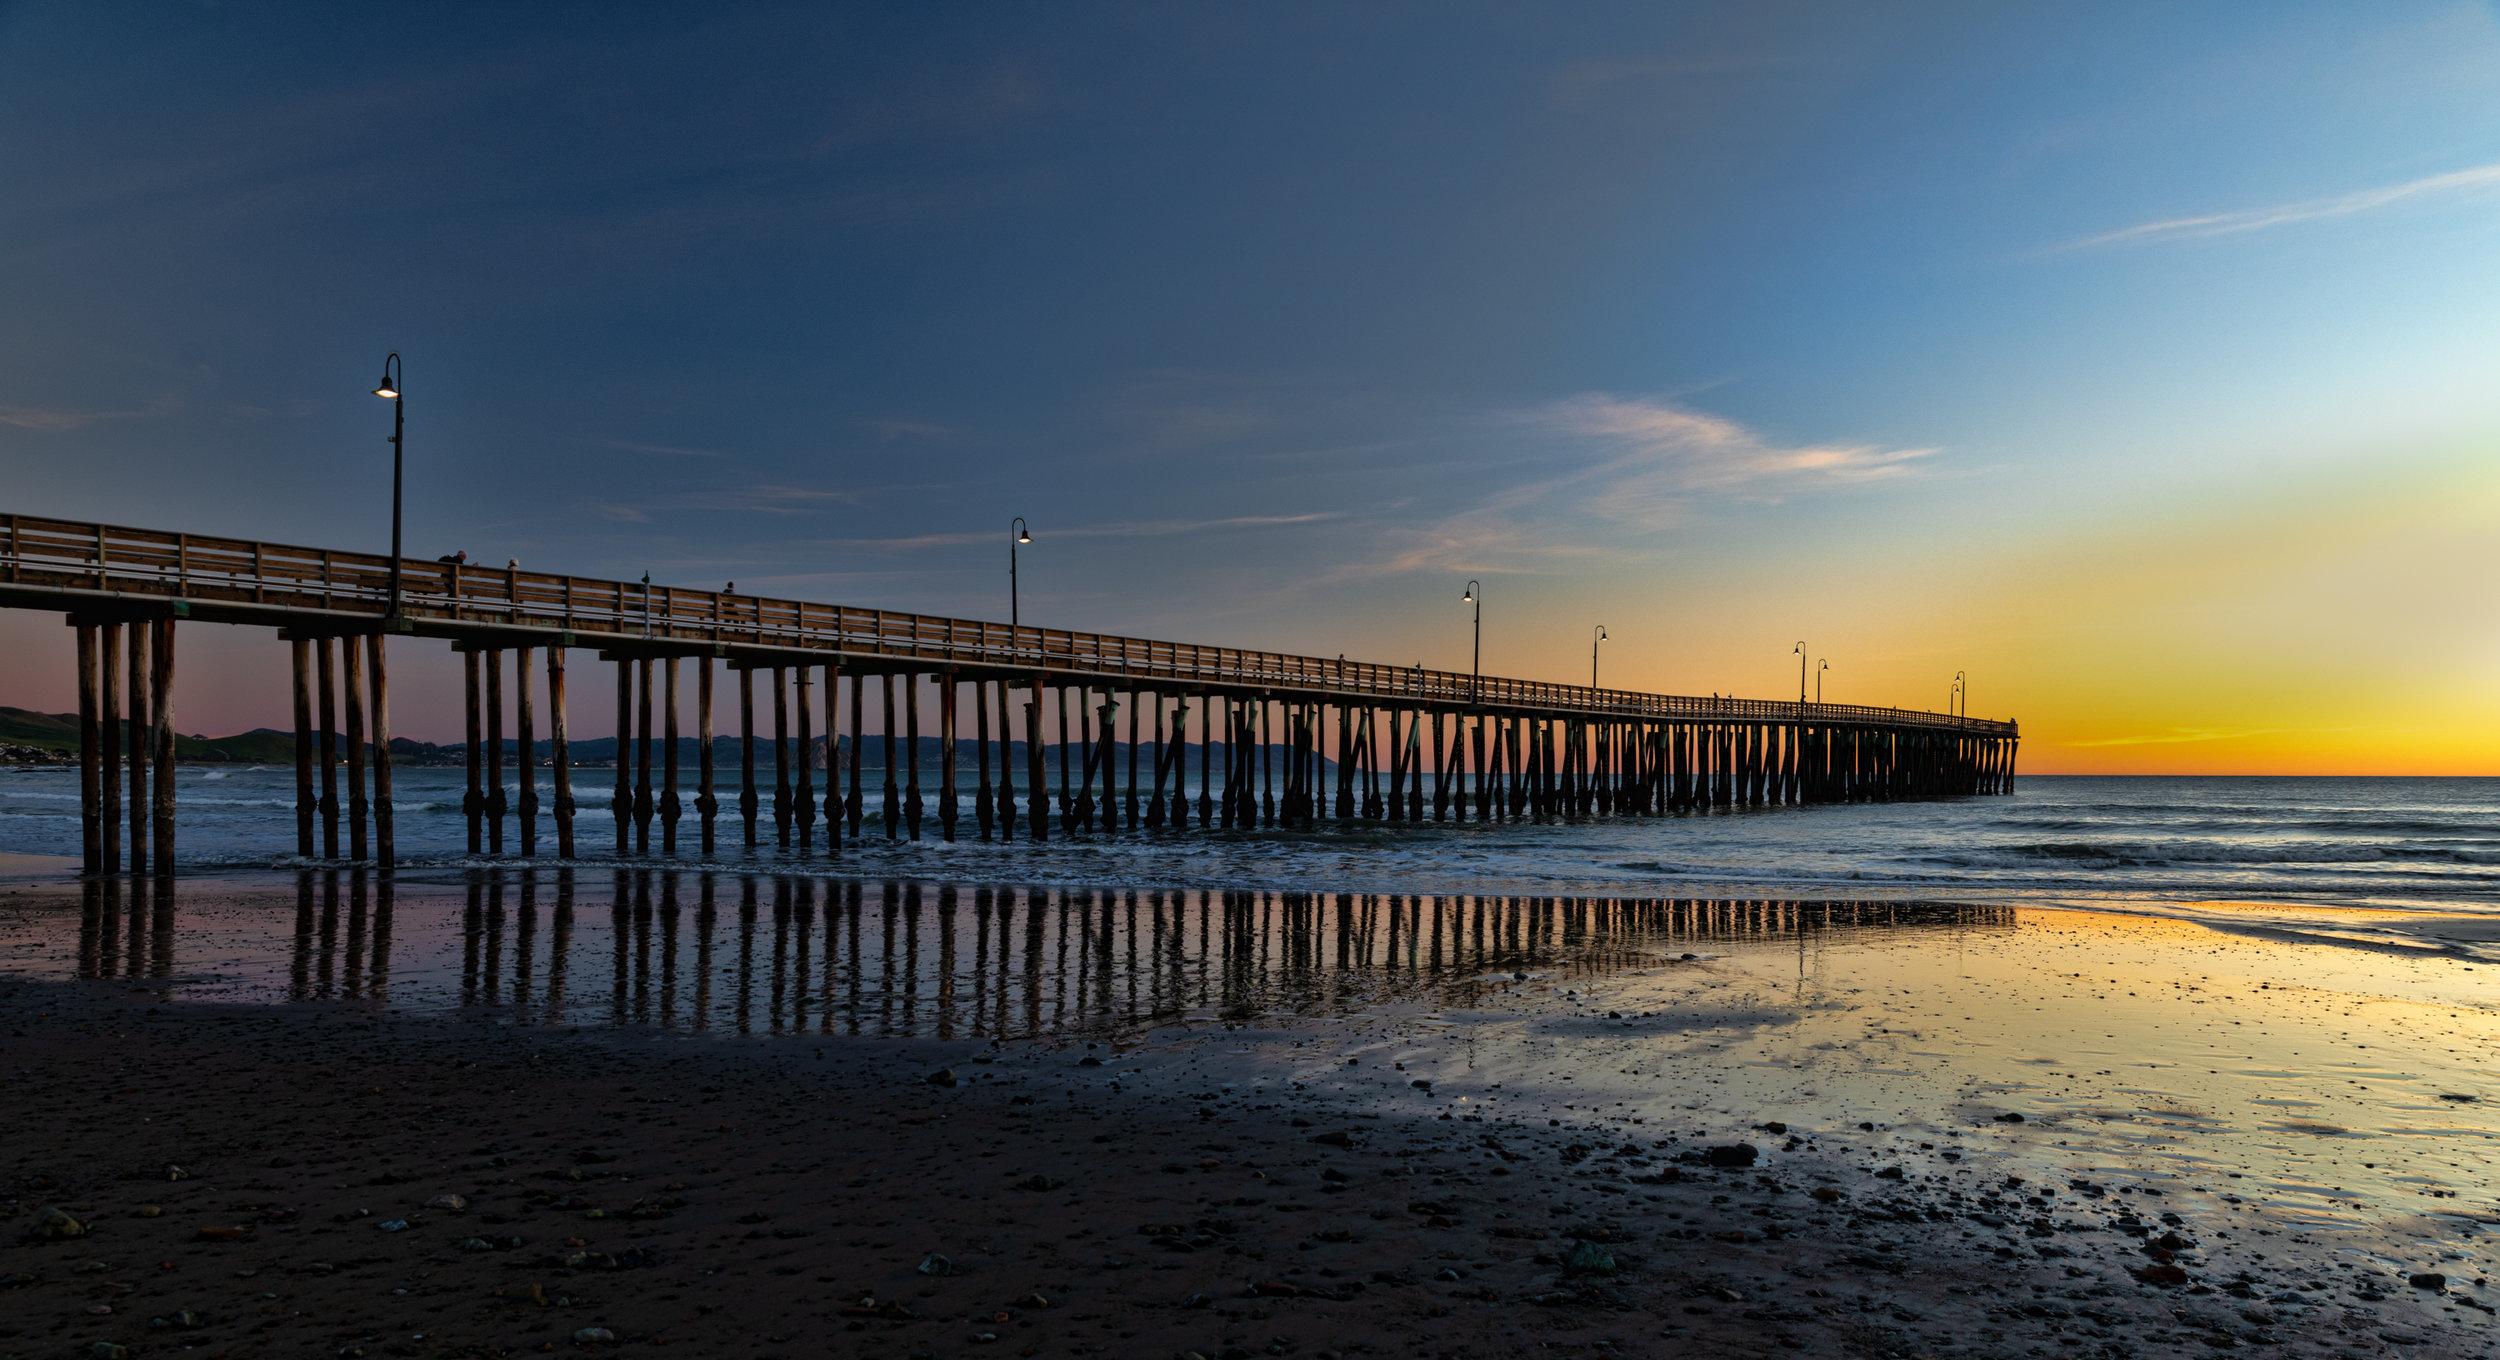 Cayucos Pier Cayucos, California Sunset